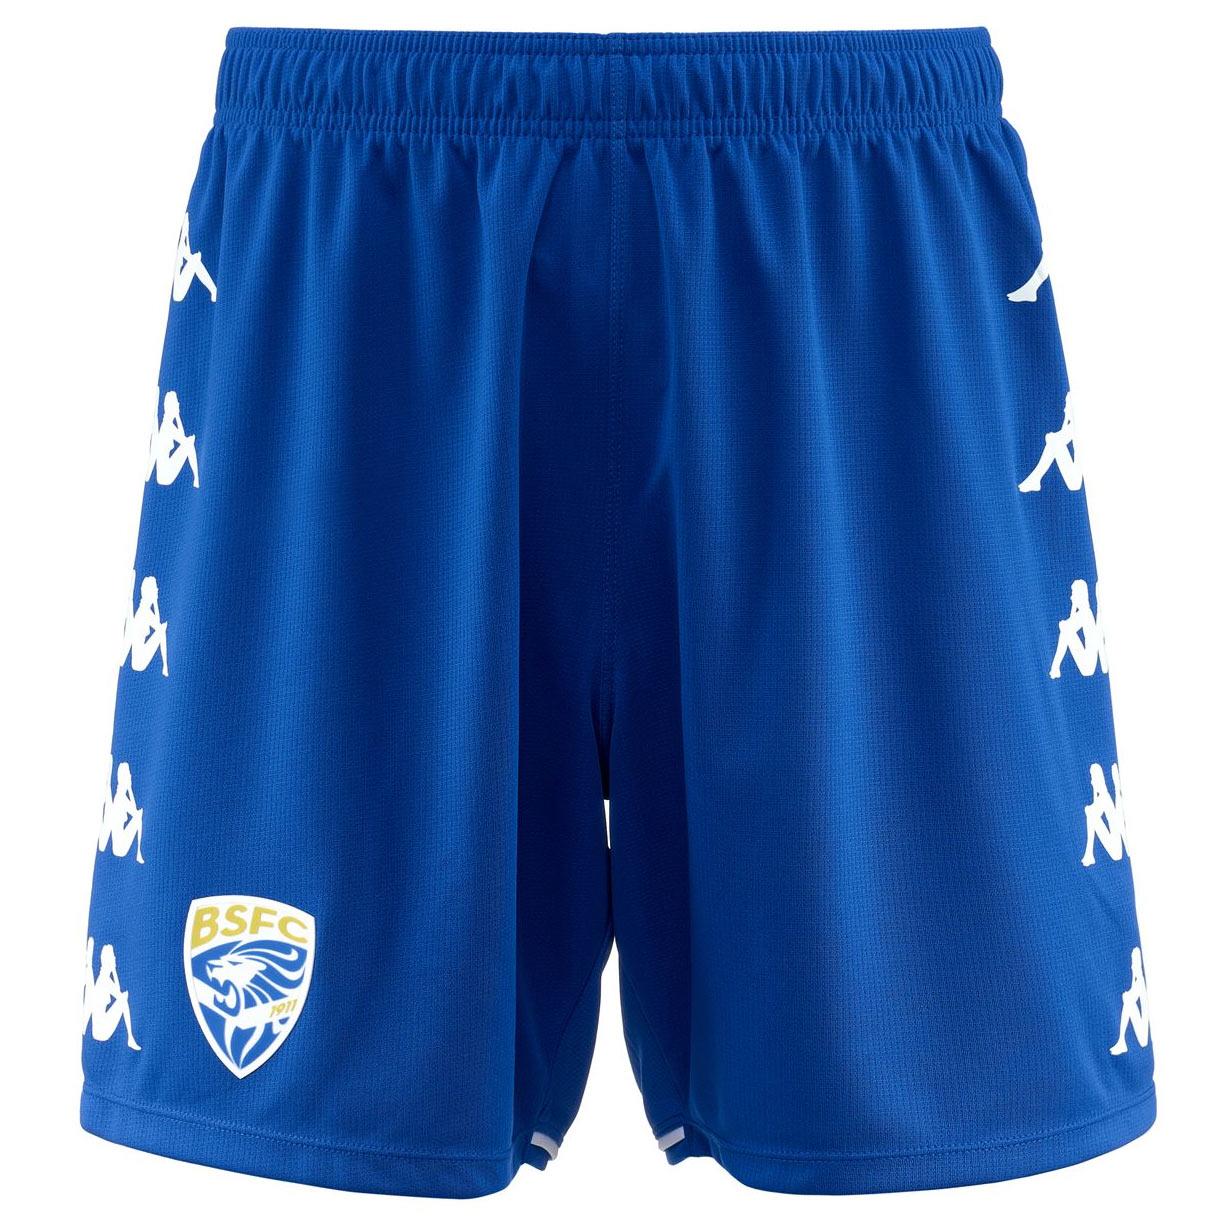 Pantaloncini Brescia blu Kappa